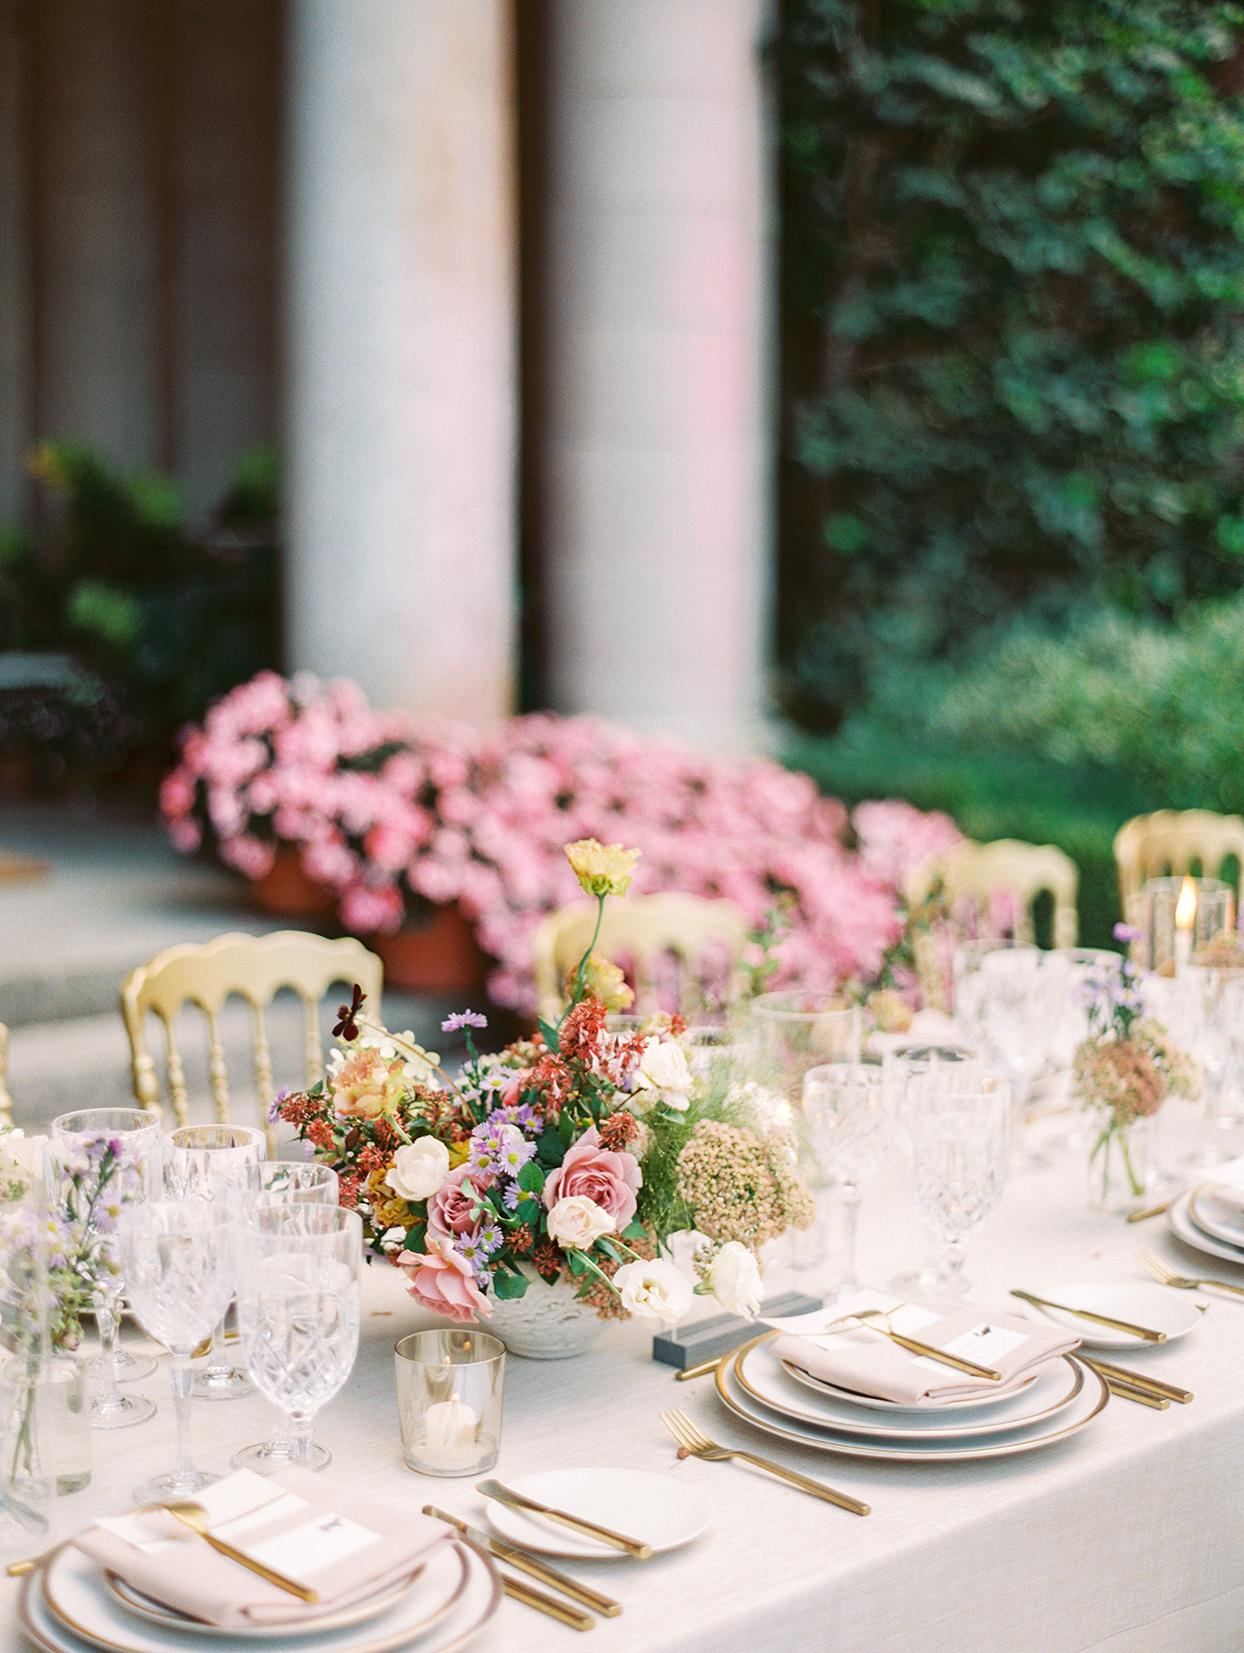 yalda anusha wedding reception table with pink hues floral centerpiece